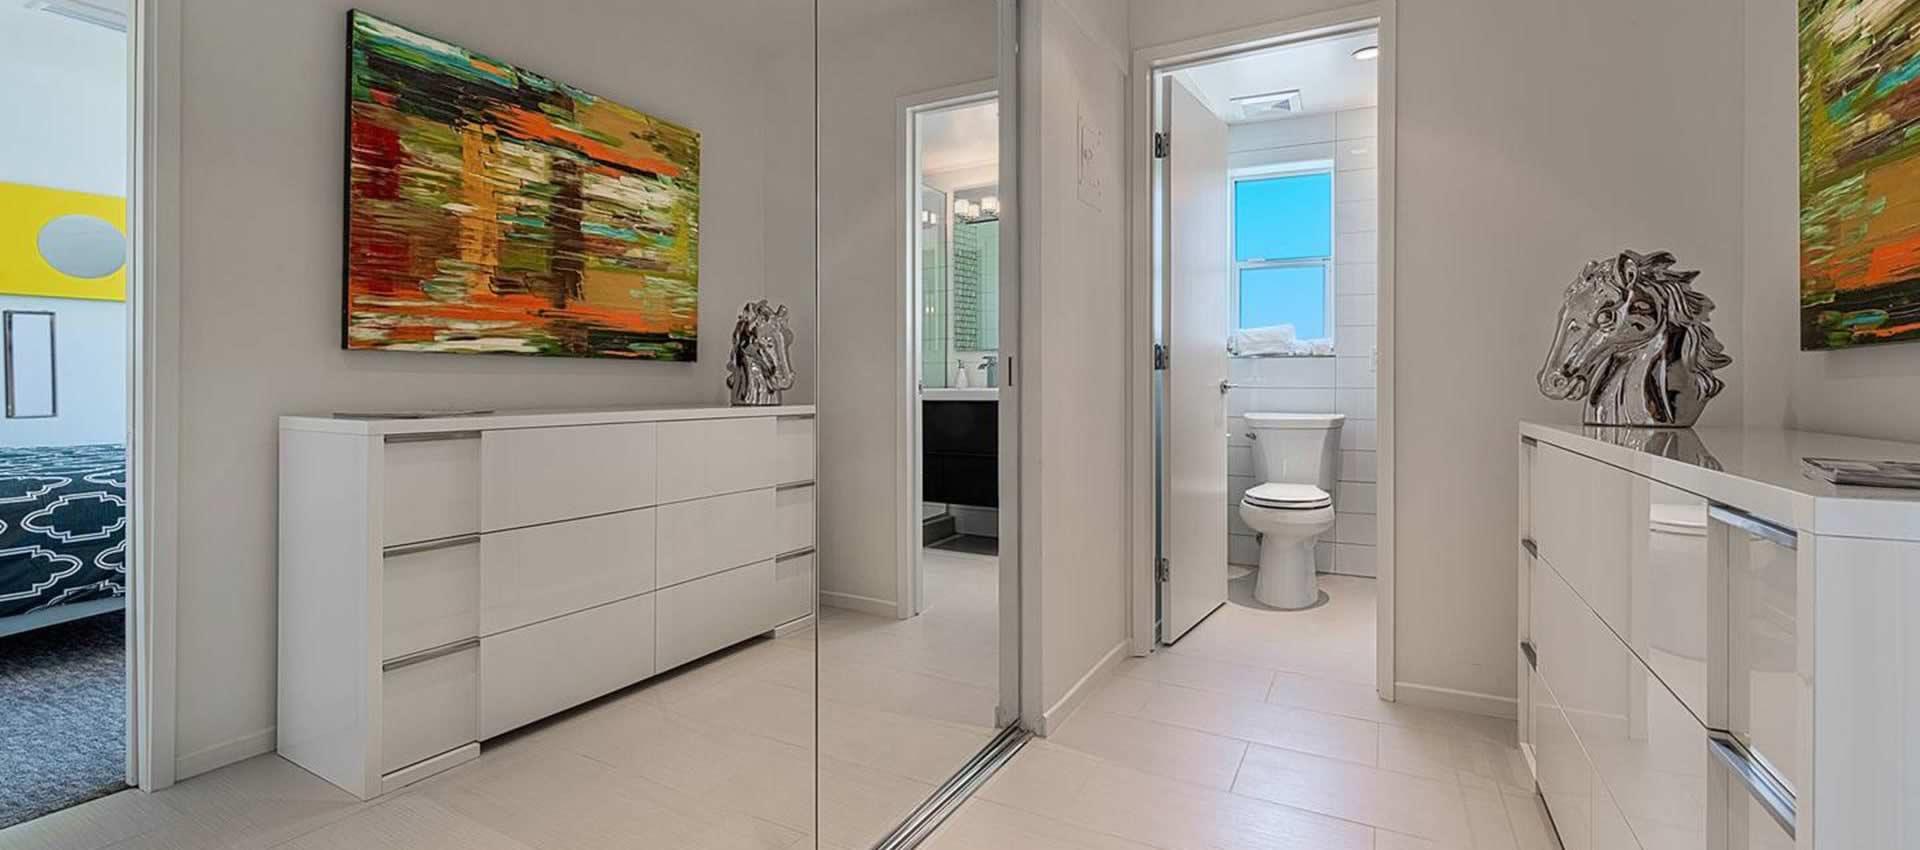 twist-hotel-room107-bath